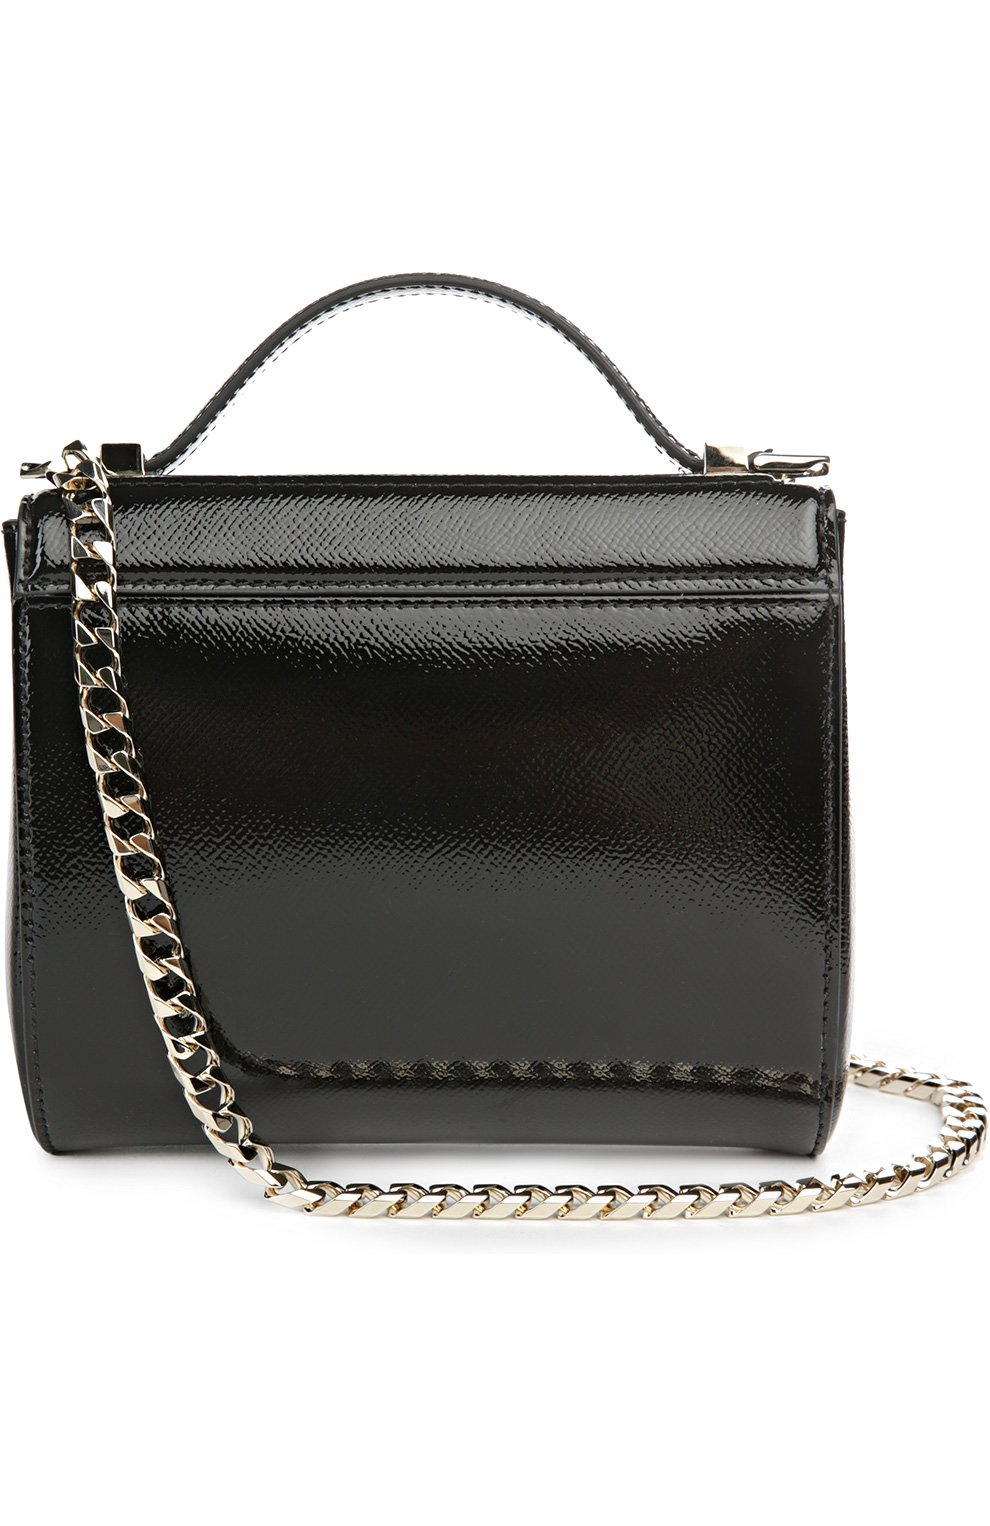 20c84584f4c5 Женская сумка pandora box mini на цепочке GIVENCHY черная цвета ...